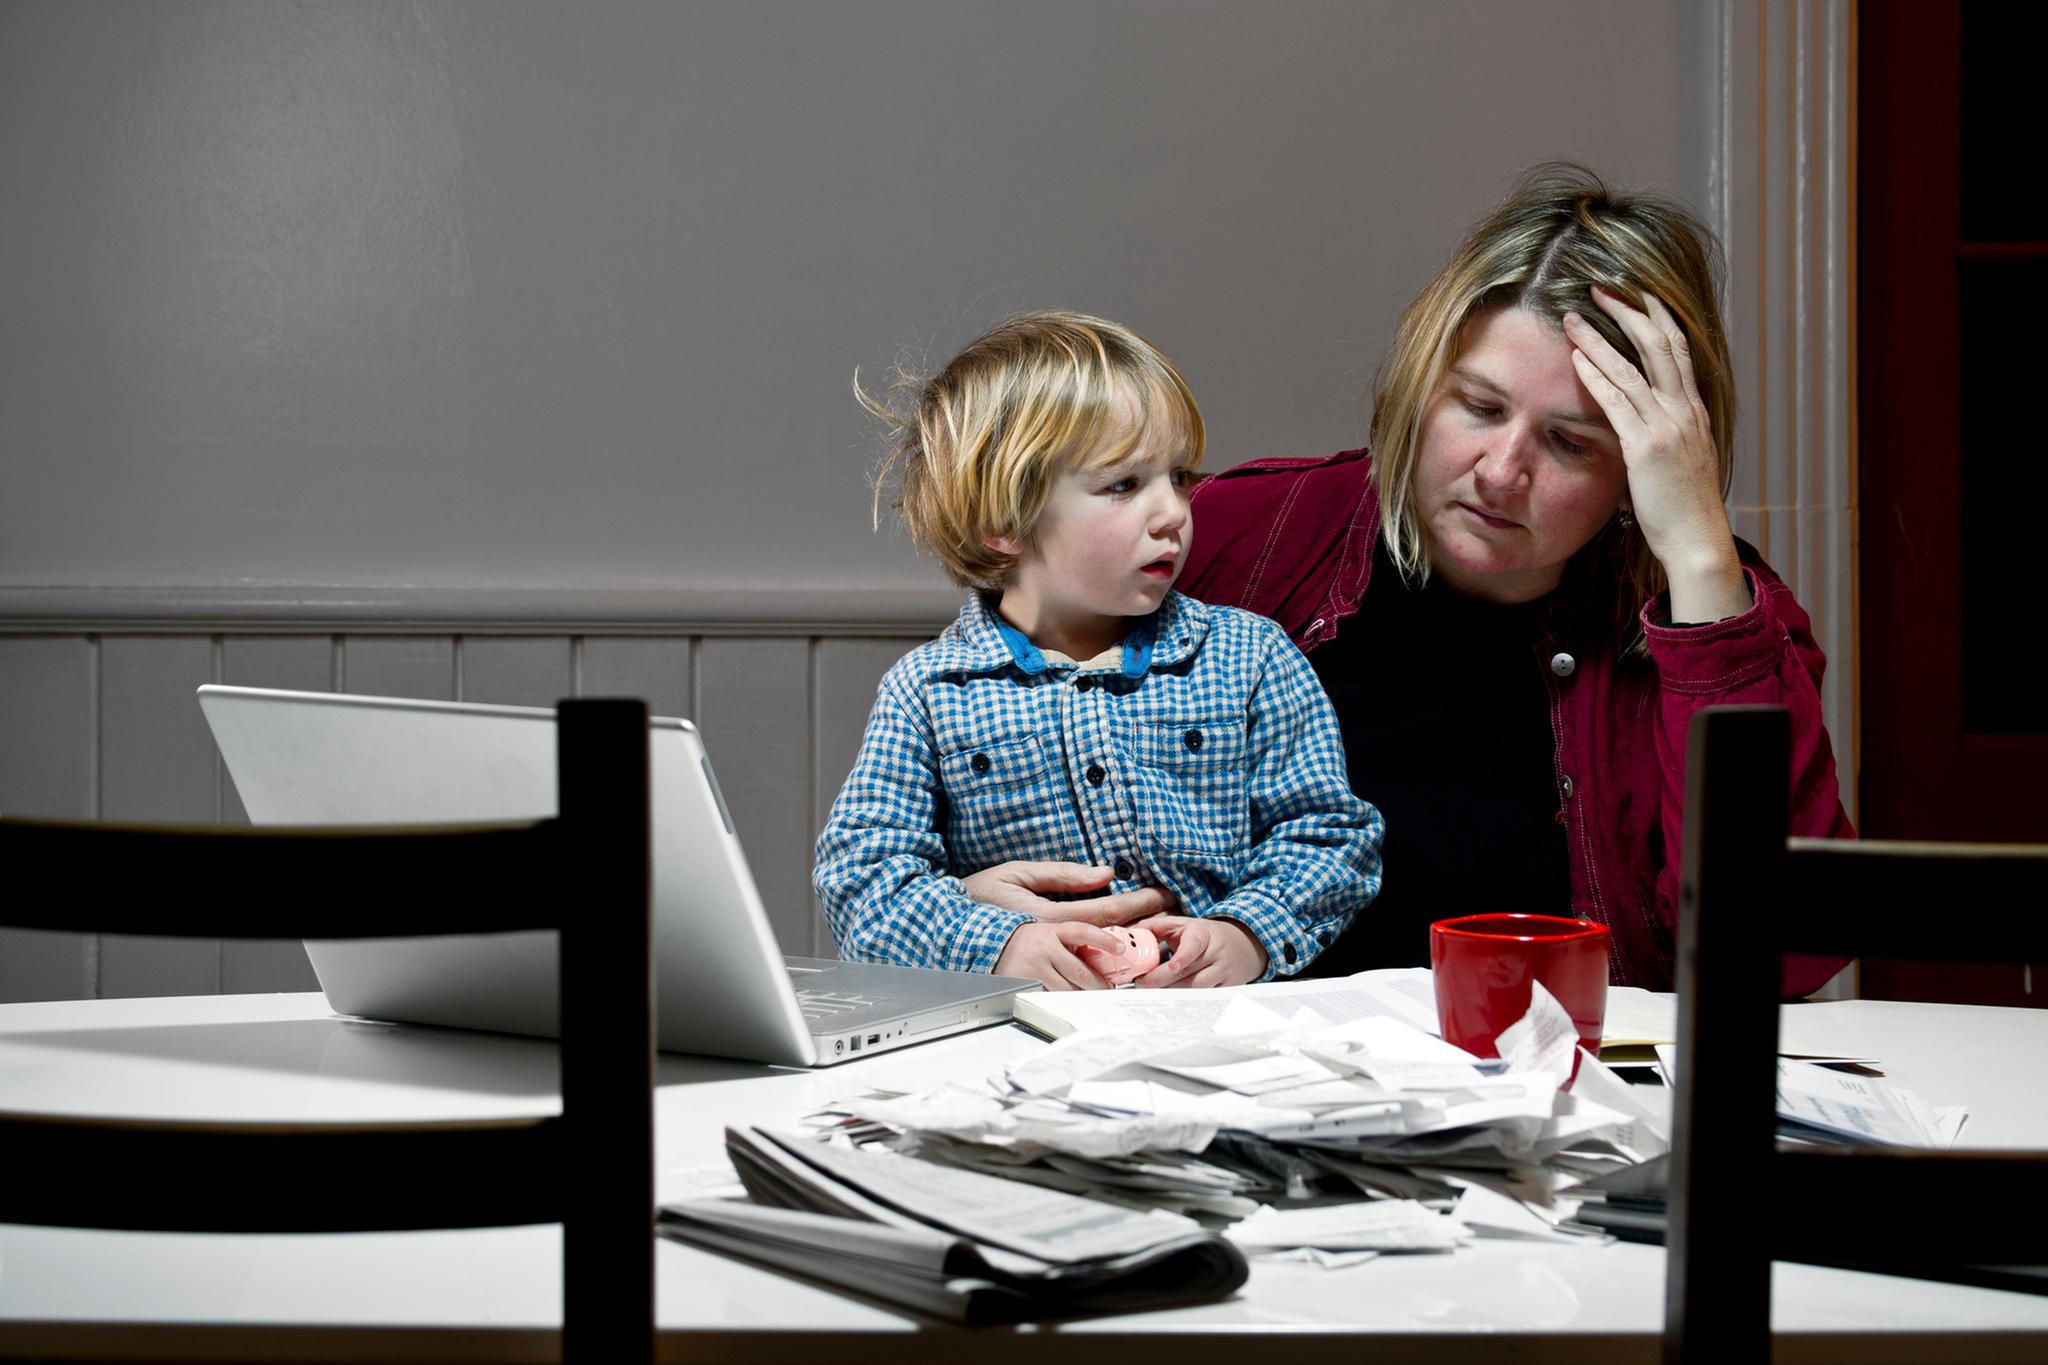 Entsorgte Mutter Protokoll einer Frau alles verlor